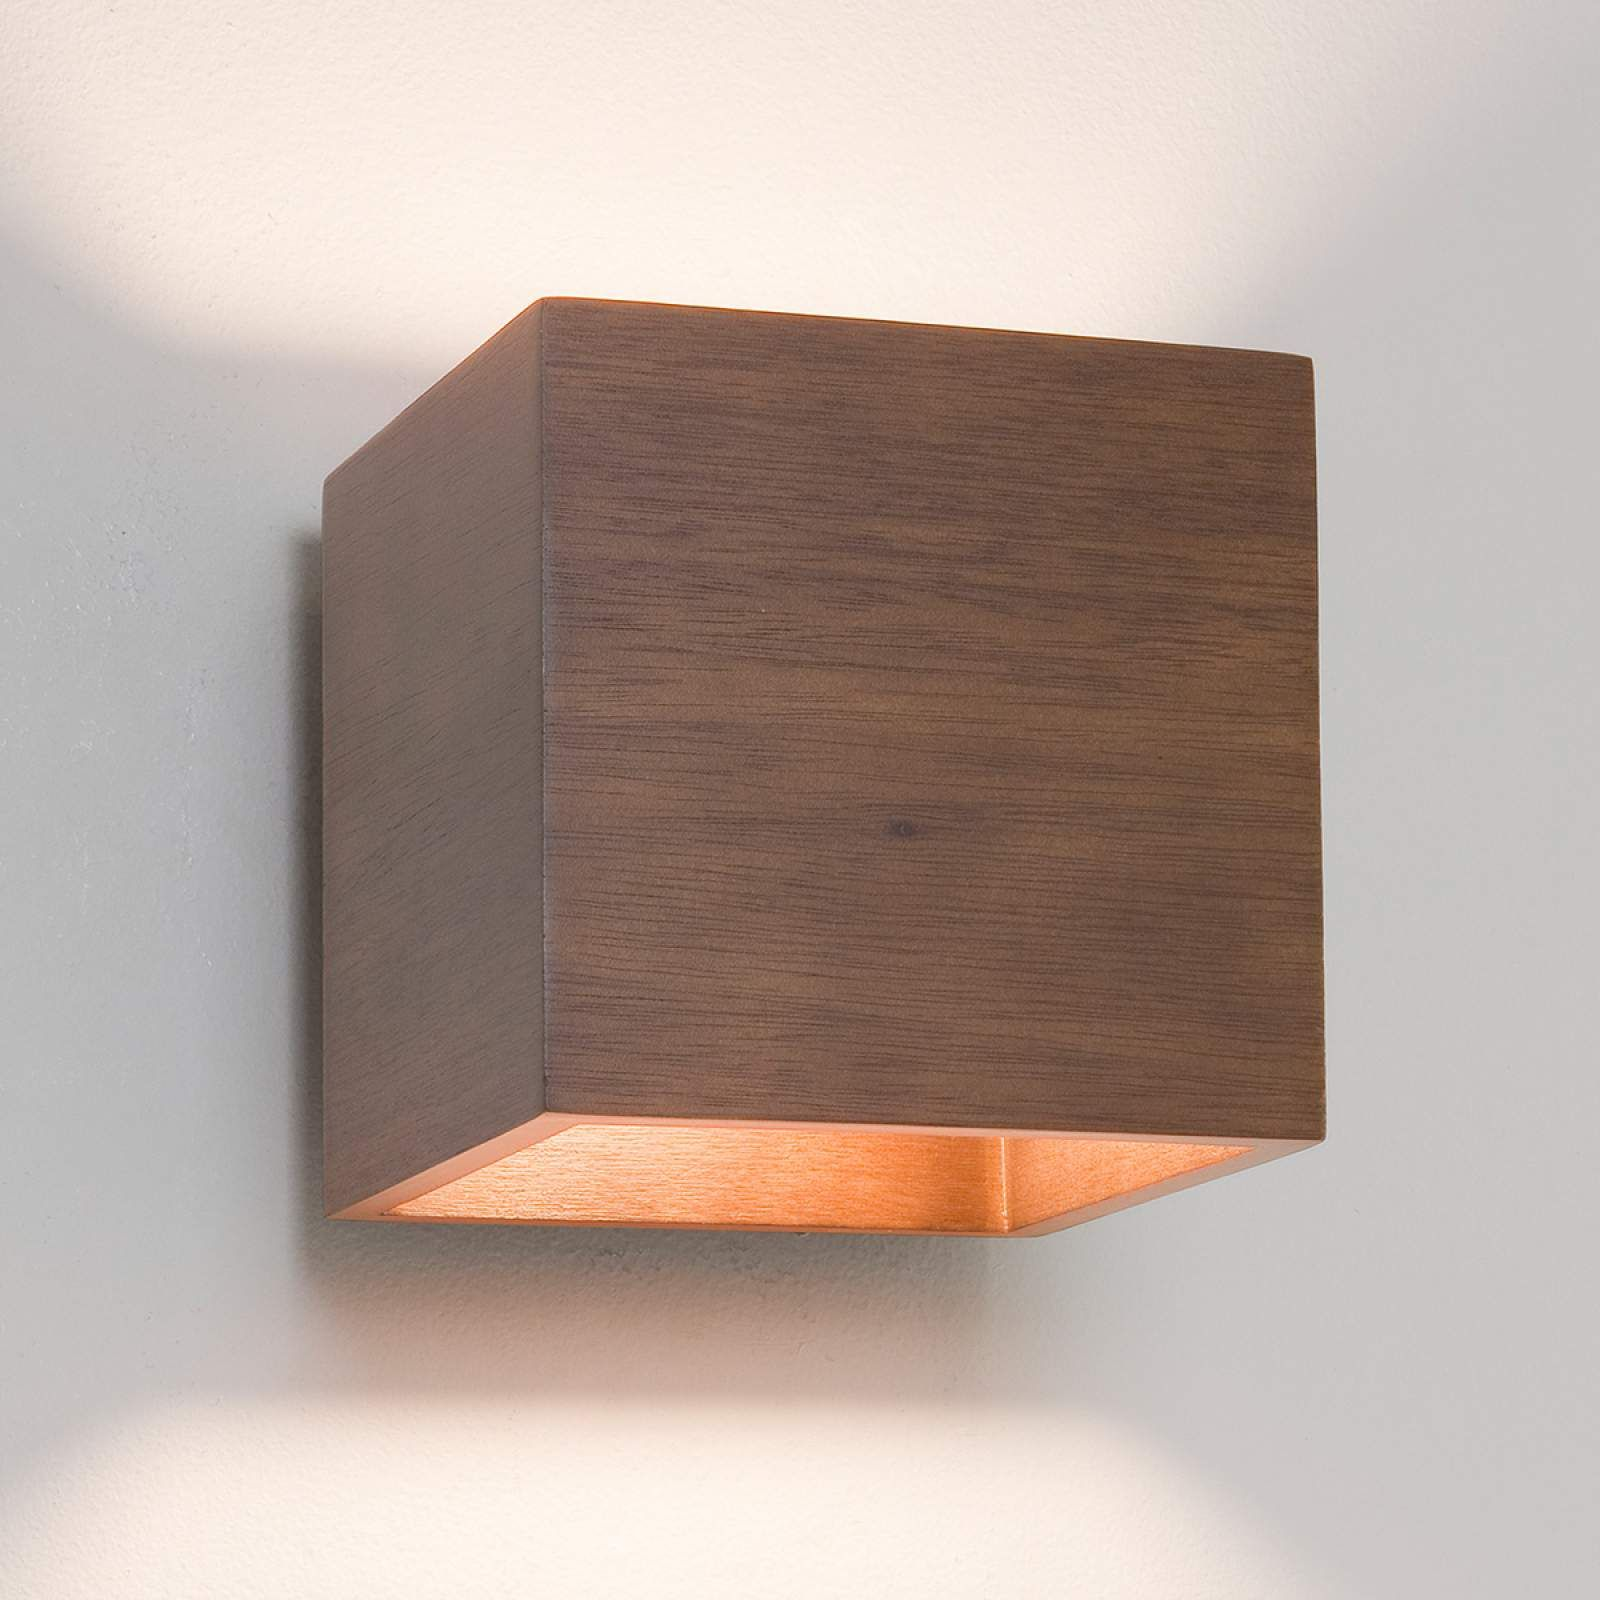 Astro Cremona Wurfelformige Holz Wandleuchte Wandleuchte Treppenhaus Beleuchtung Lampen Treppenhaus